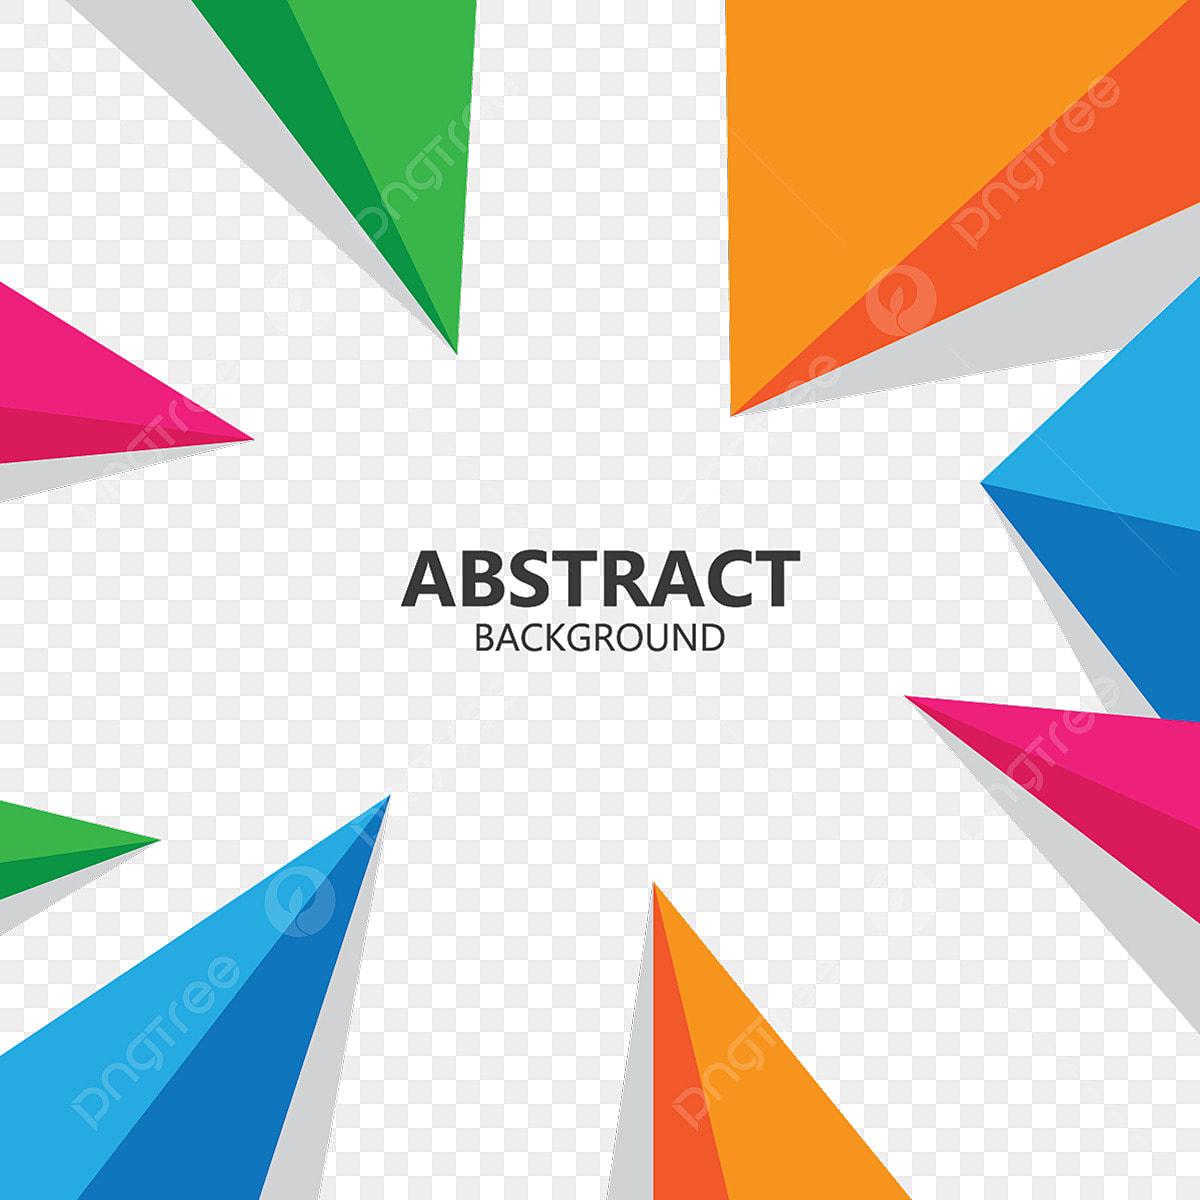 Abstract Geometric Polygonal Shape Background Illustration